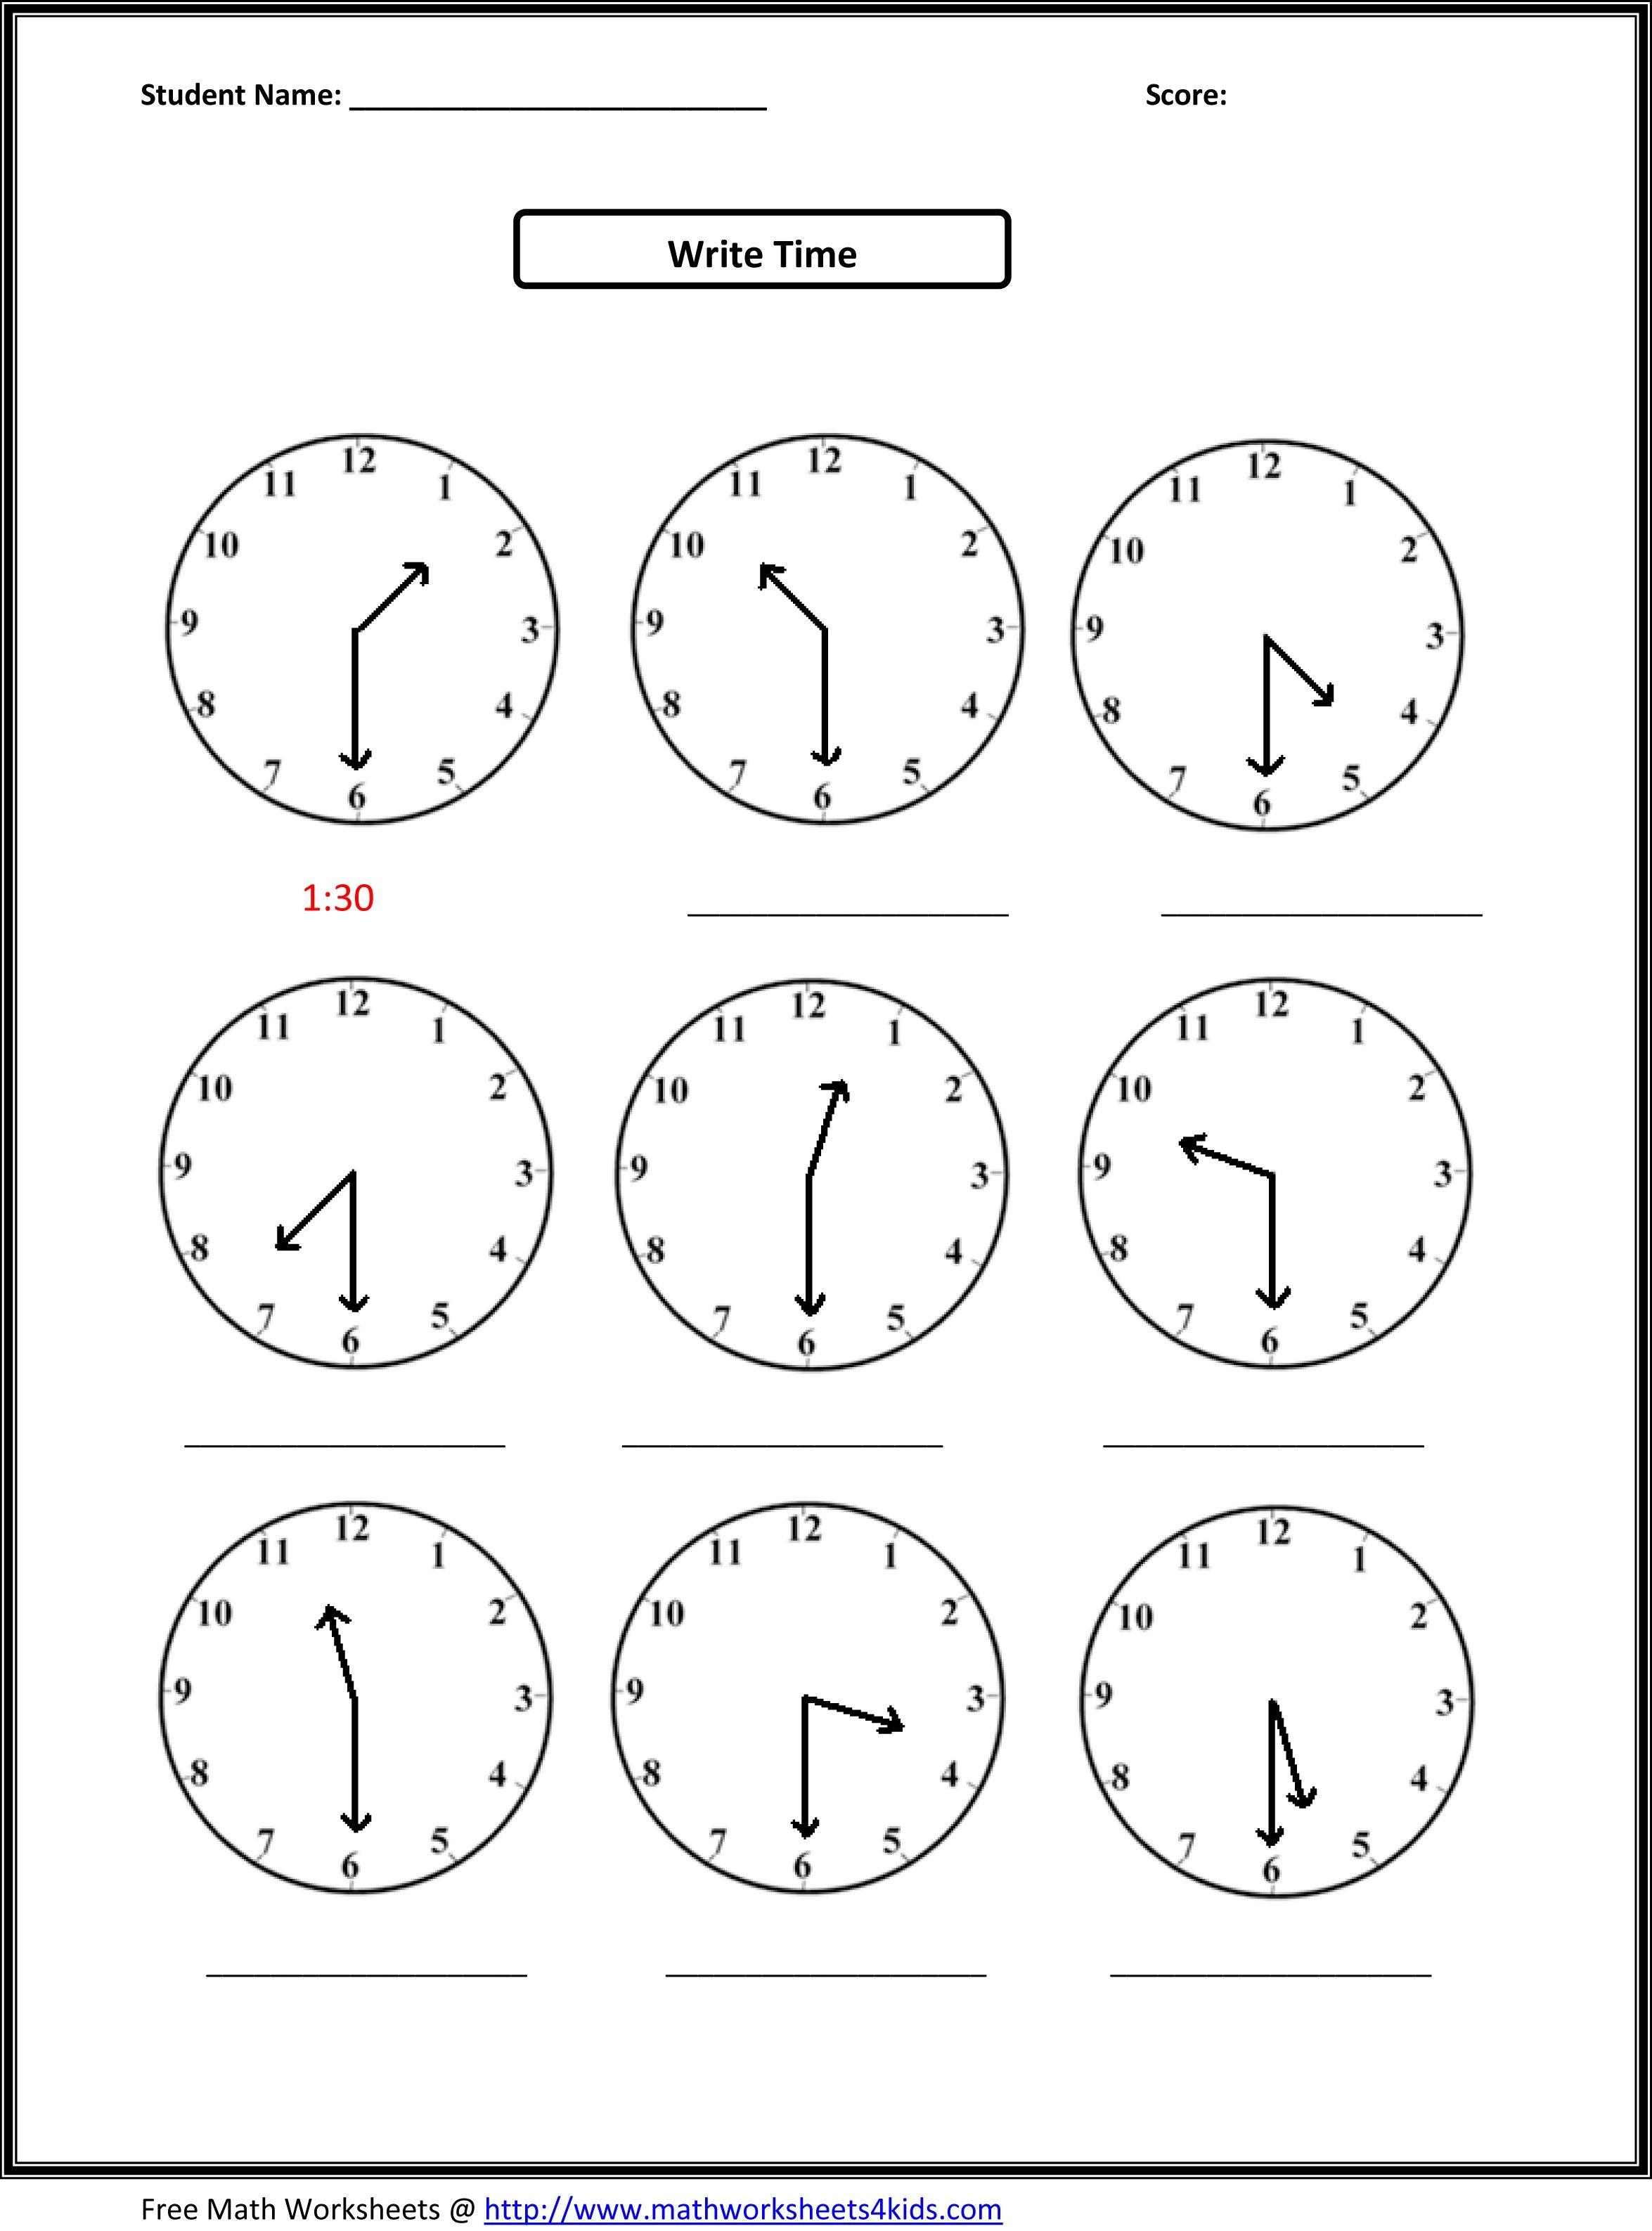 2Nd Grade Free Worksheets Math | Math: Time/measurement | 2Nd Grade | Second Grade Printable Worksheets